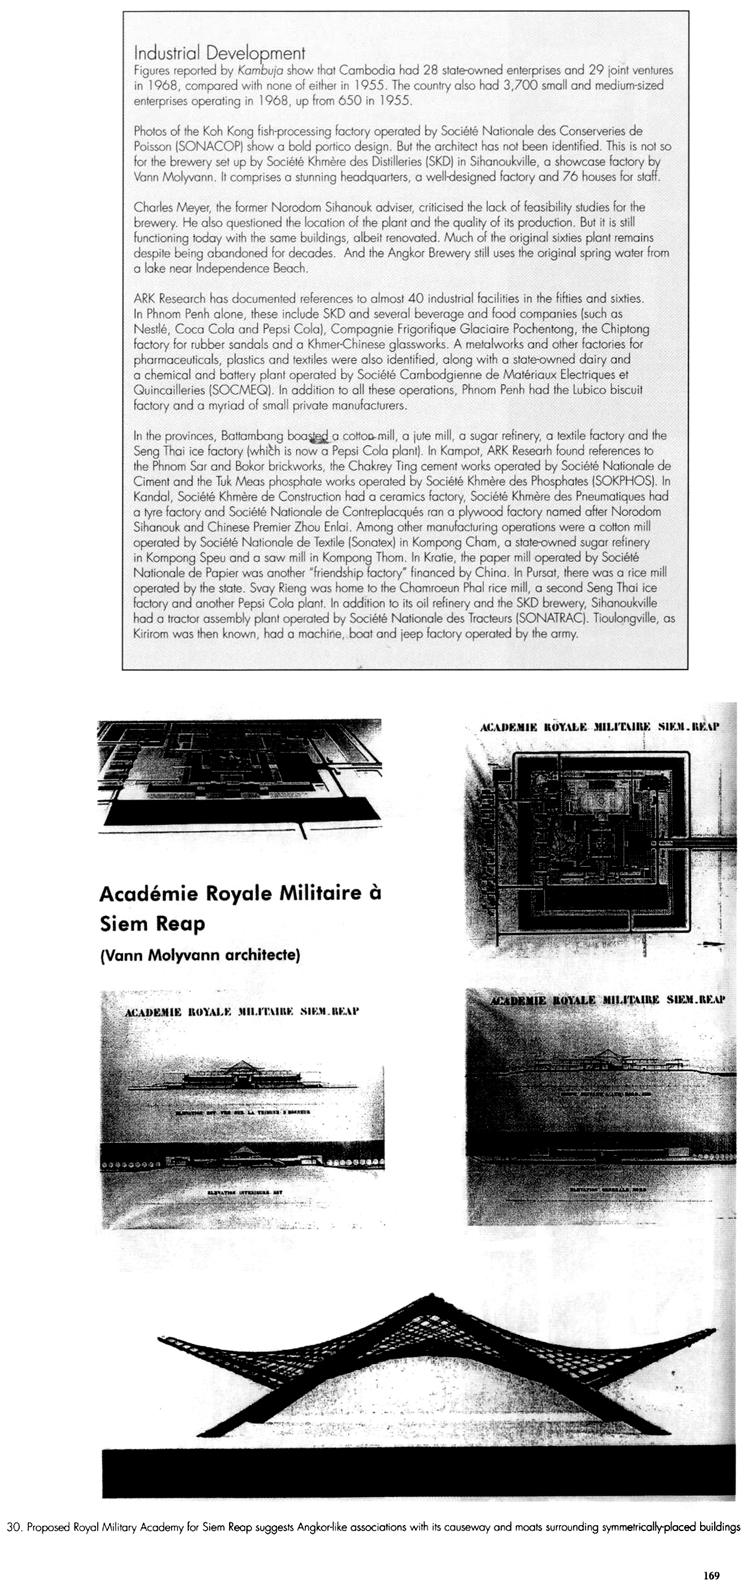 All/document/Documents/BuildingCambodia/BuildingCambodia/id826/photo005.jpg